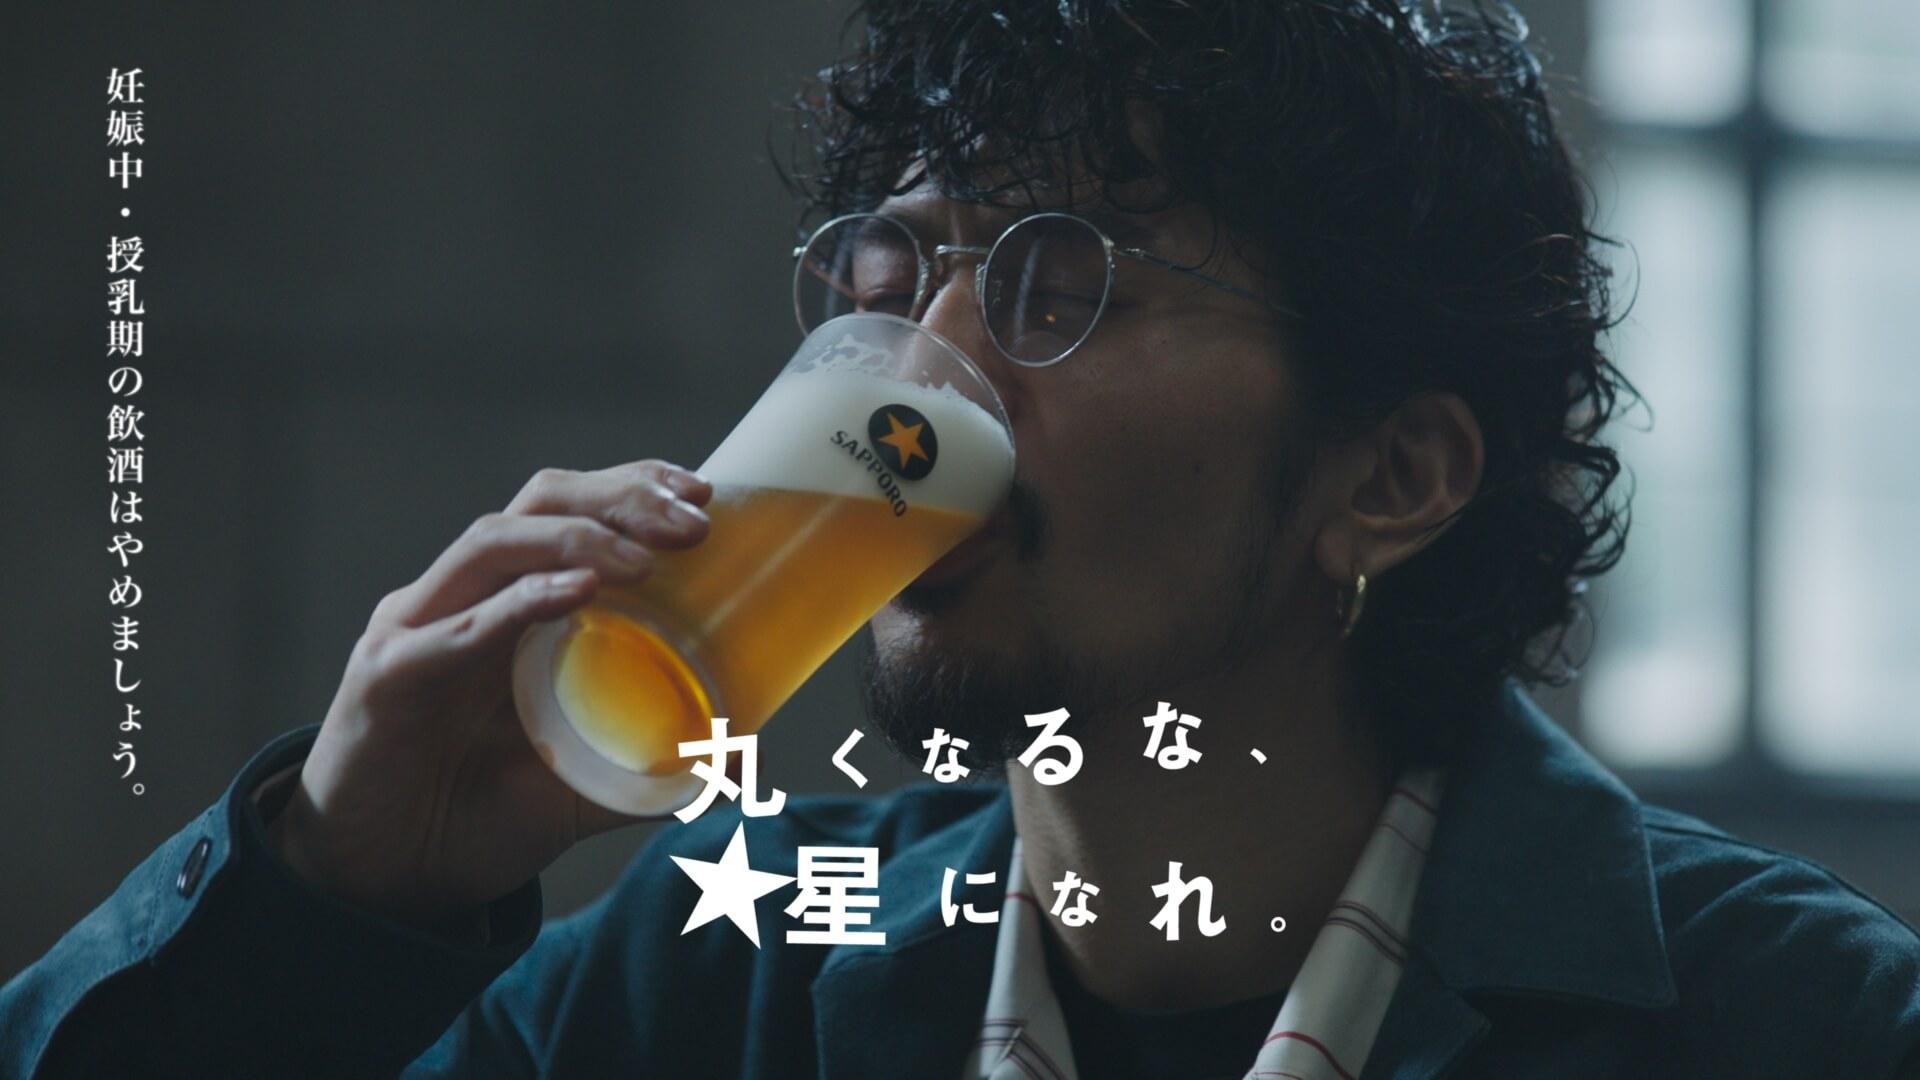 King Gnu常田大希が音楽について語るサッポロビールのCM新バージョンが放映決定!ホームページで特別メッセージムービーも公開 art200707_tsunetadaiki_beer_7